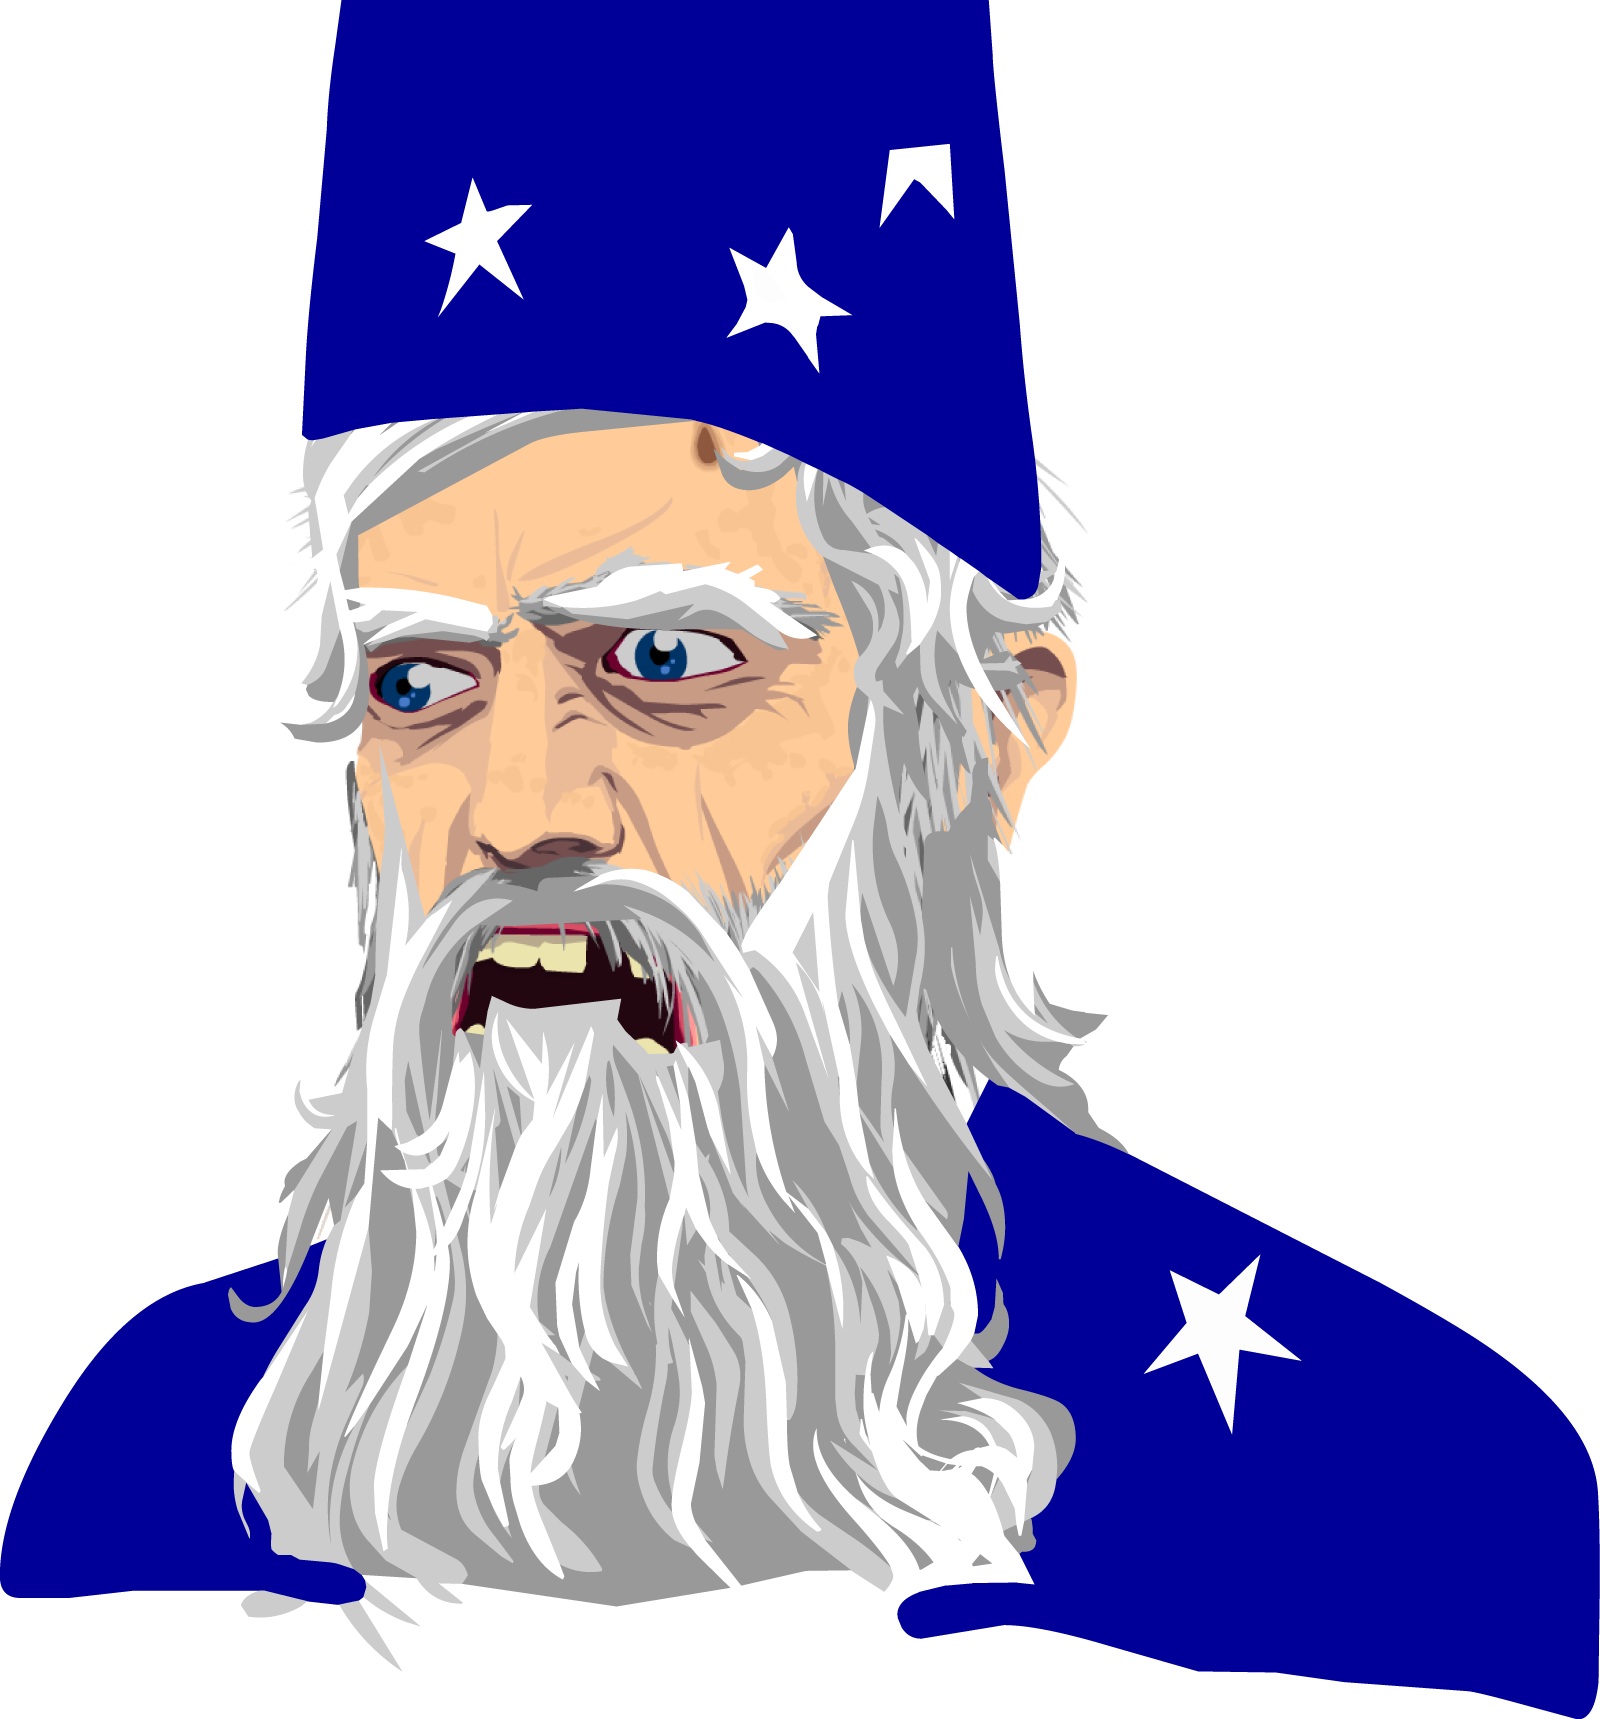 Image - Wizard Guy (Smaller Image).png | Happy Wheels Wiki ... Happy Wheels Total Jerkface